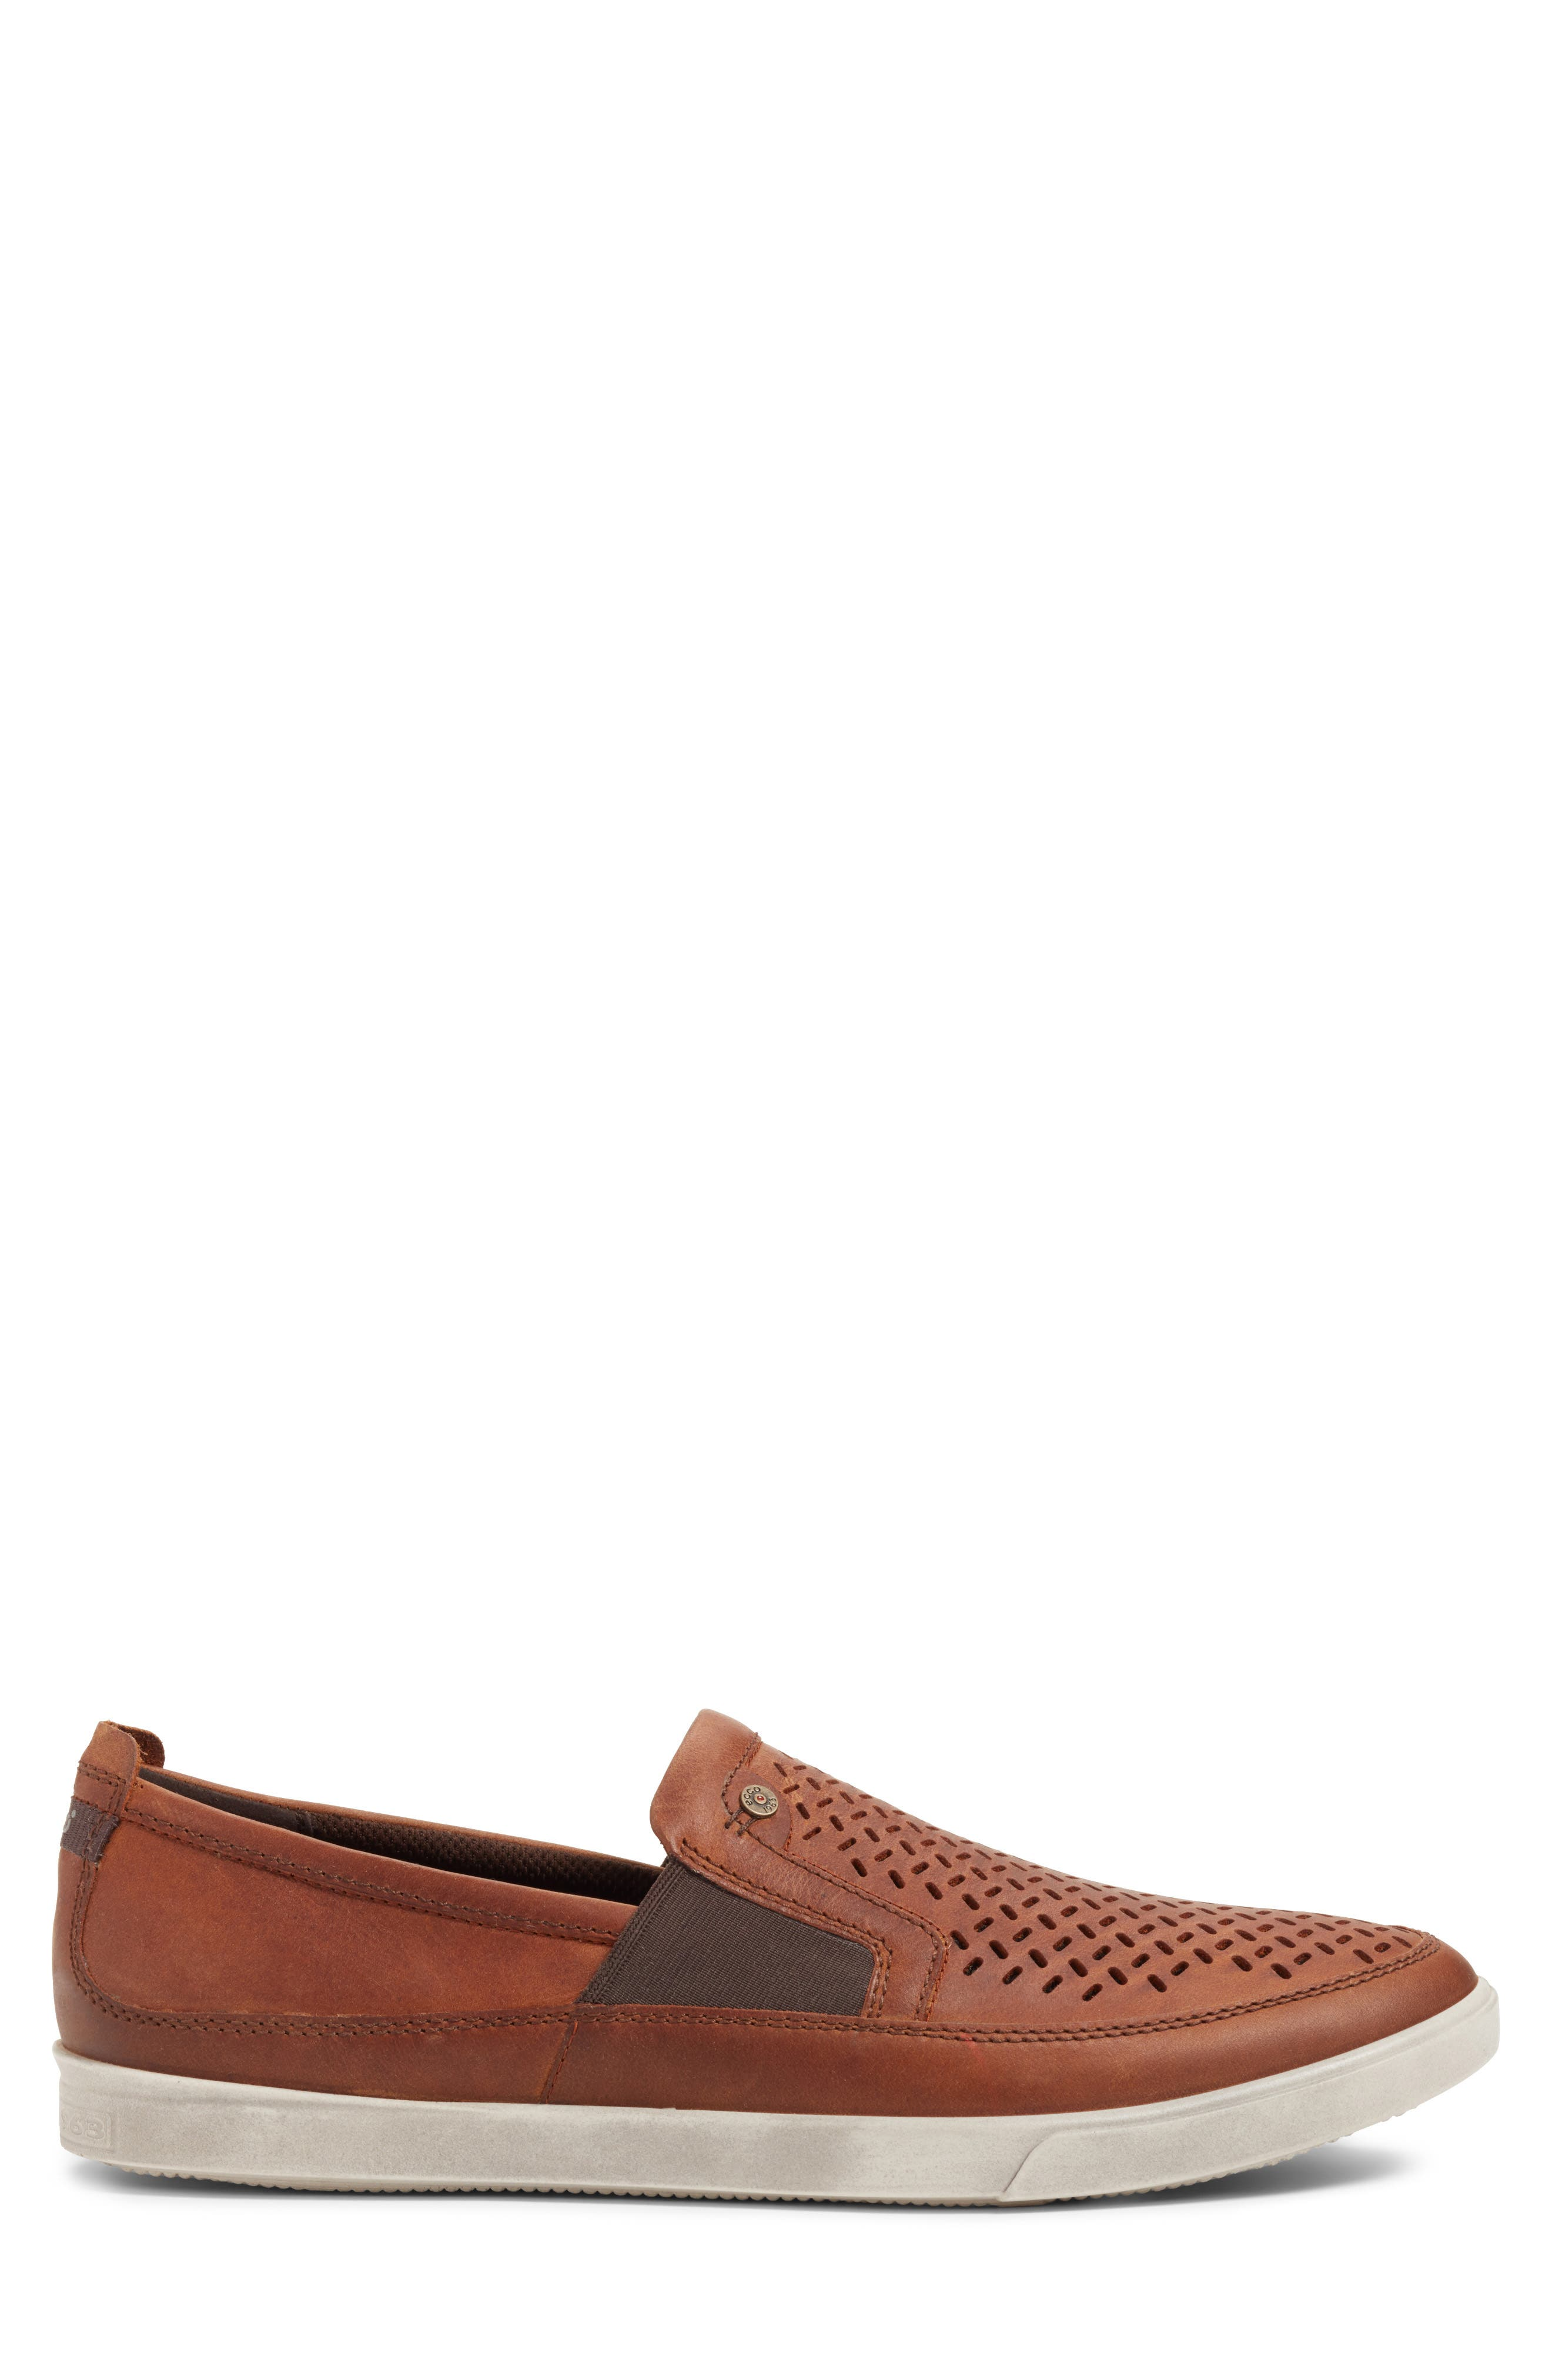 Alternate Image 3  - ECCO 'Collin' Perforated Slip On Sneaker (Men)